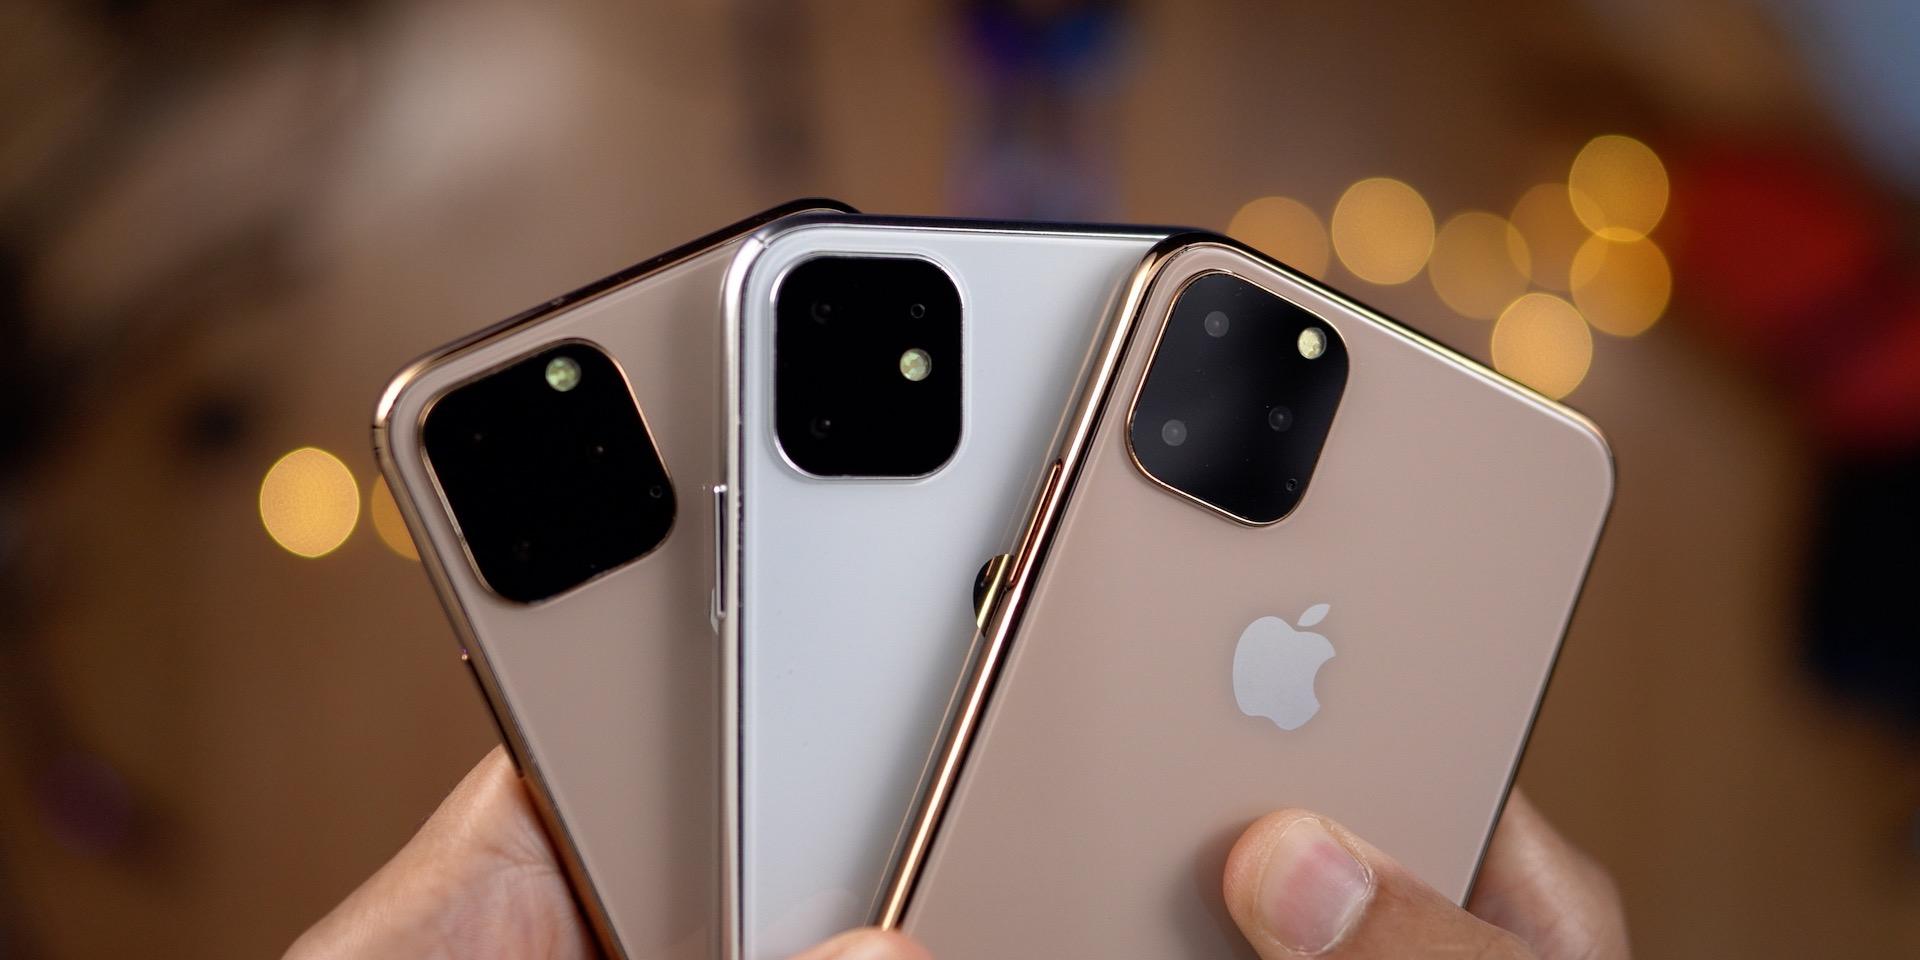 iPhone 11 dummy models